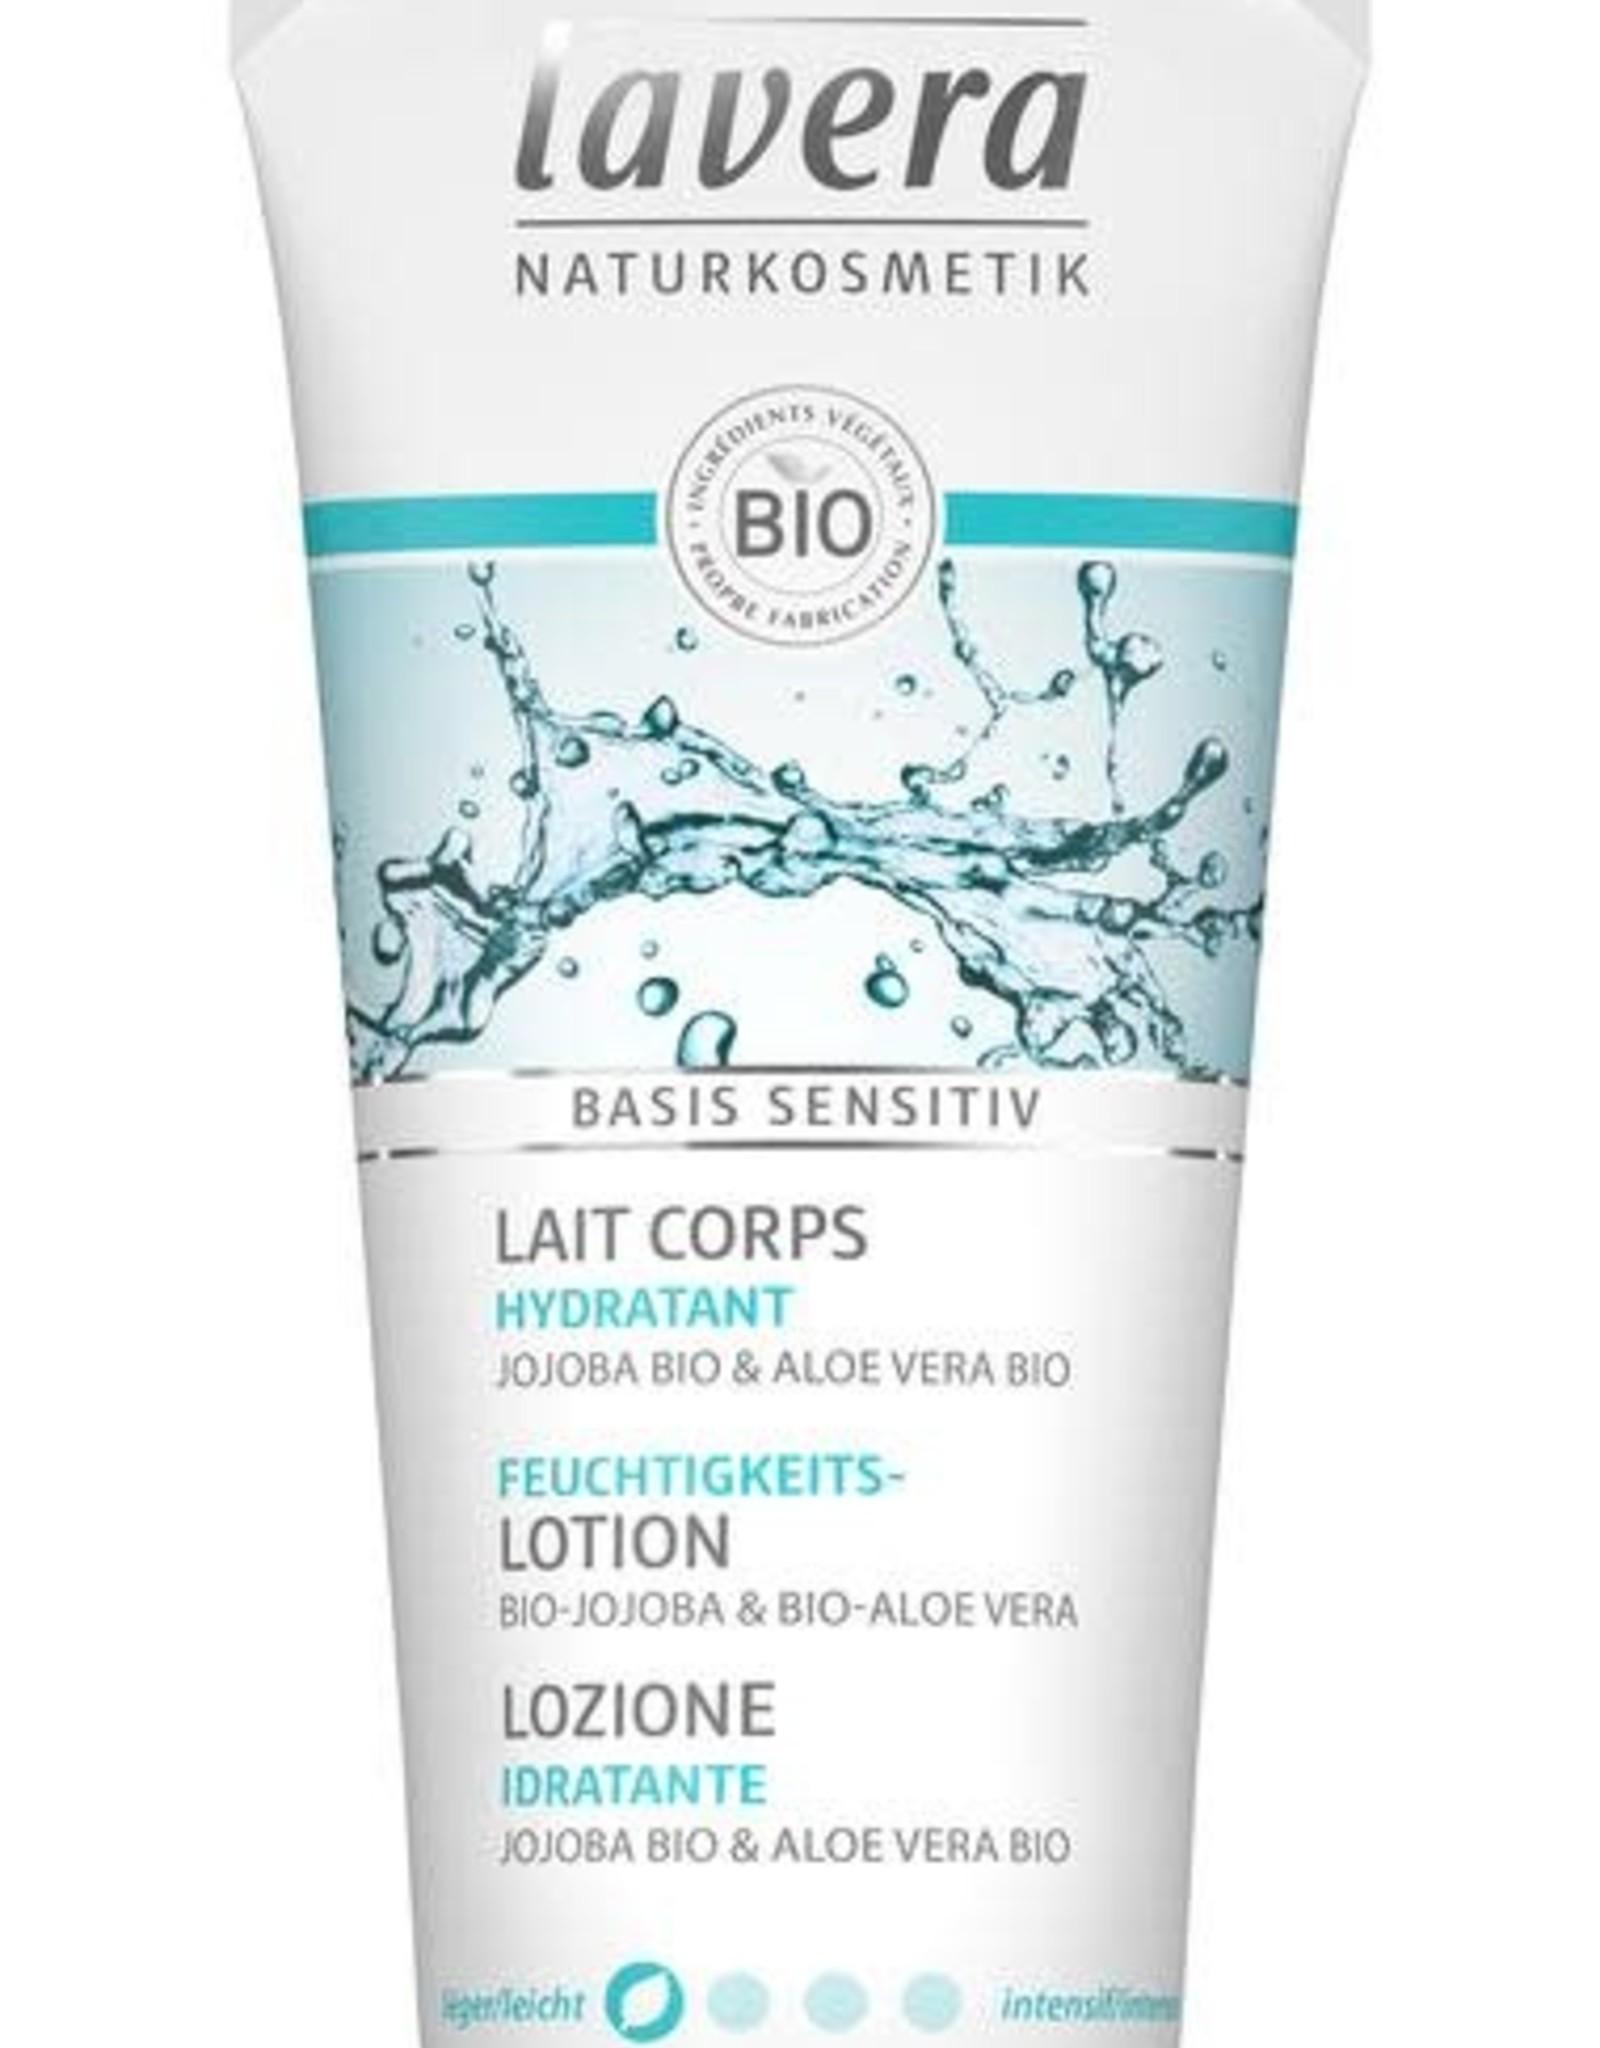 Lavera Basis Sensitiv bodylotion moisturising  200ml